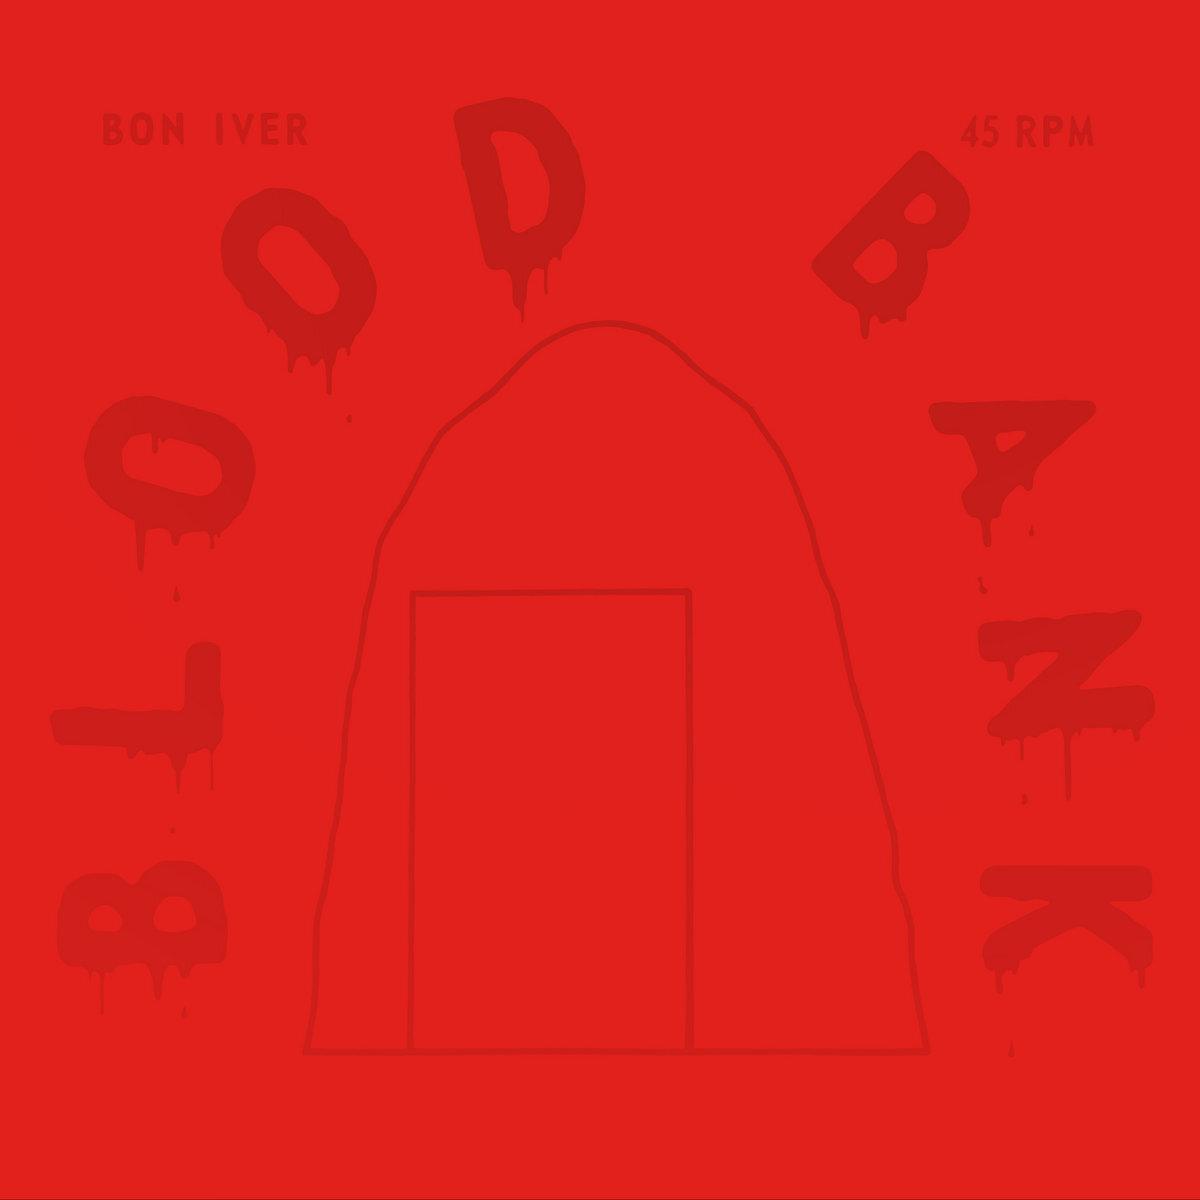 Bon Iver / Blood Bank (Ltd 10th Anniversary Edition 12inch EP)